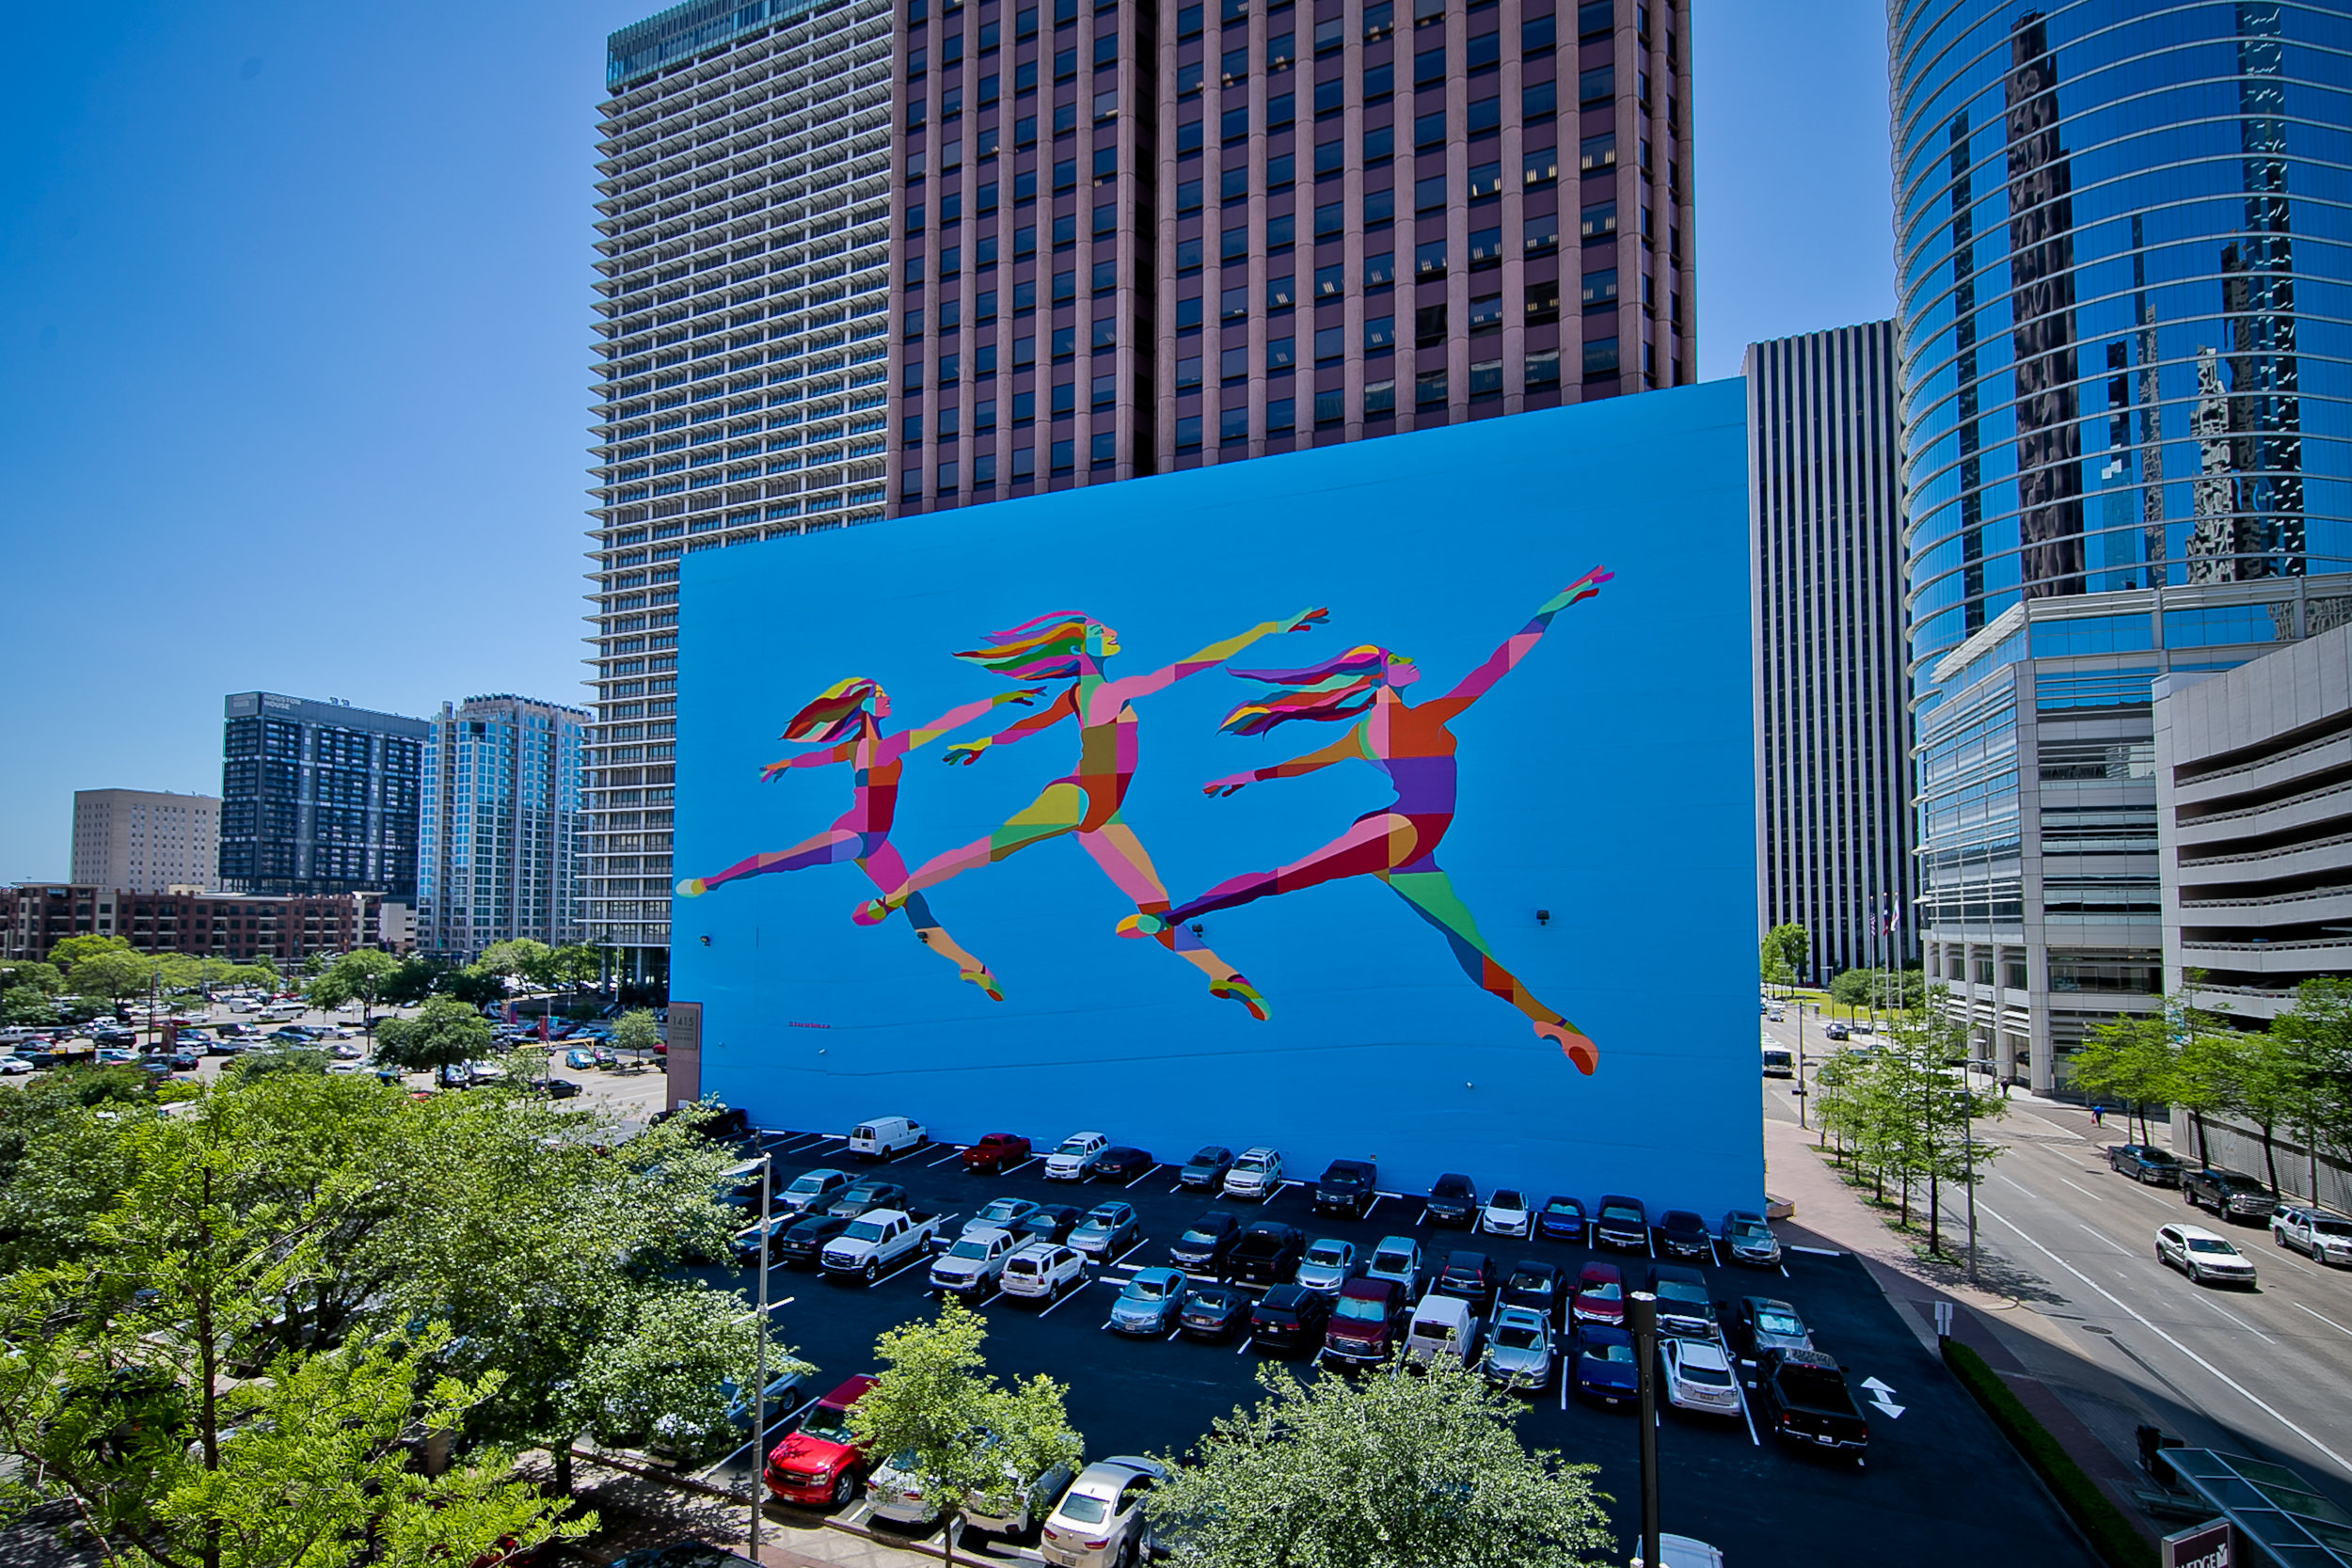 Skydance Mural, Houston, Texas. Photo by Morris Malakoff.